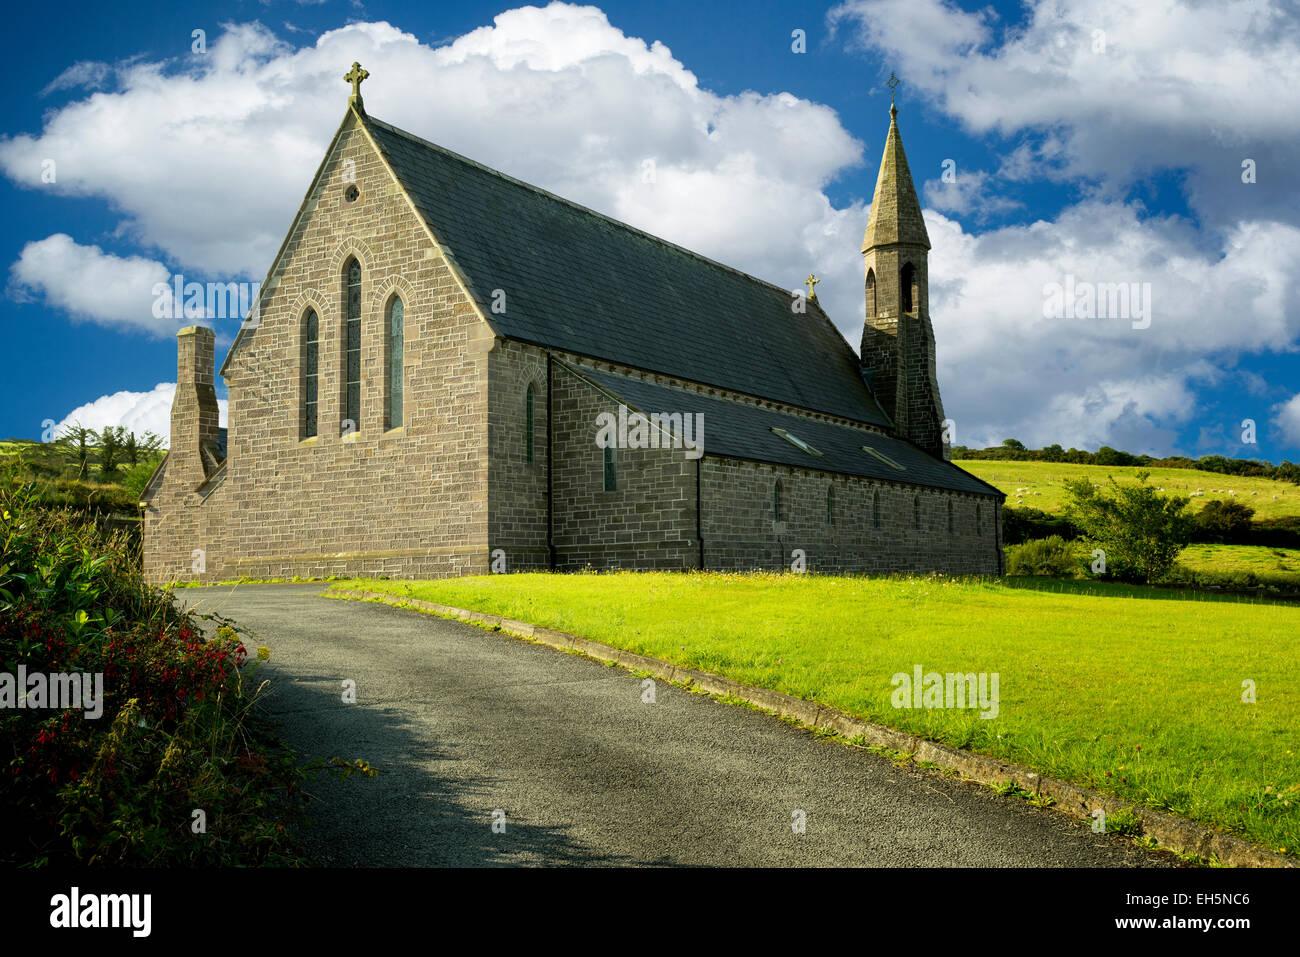 Kirche von Johannes dem Täufer. Katholische Kirche in Dingle, Irland Stockbild